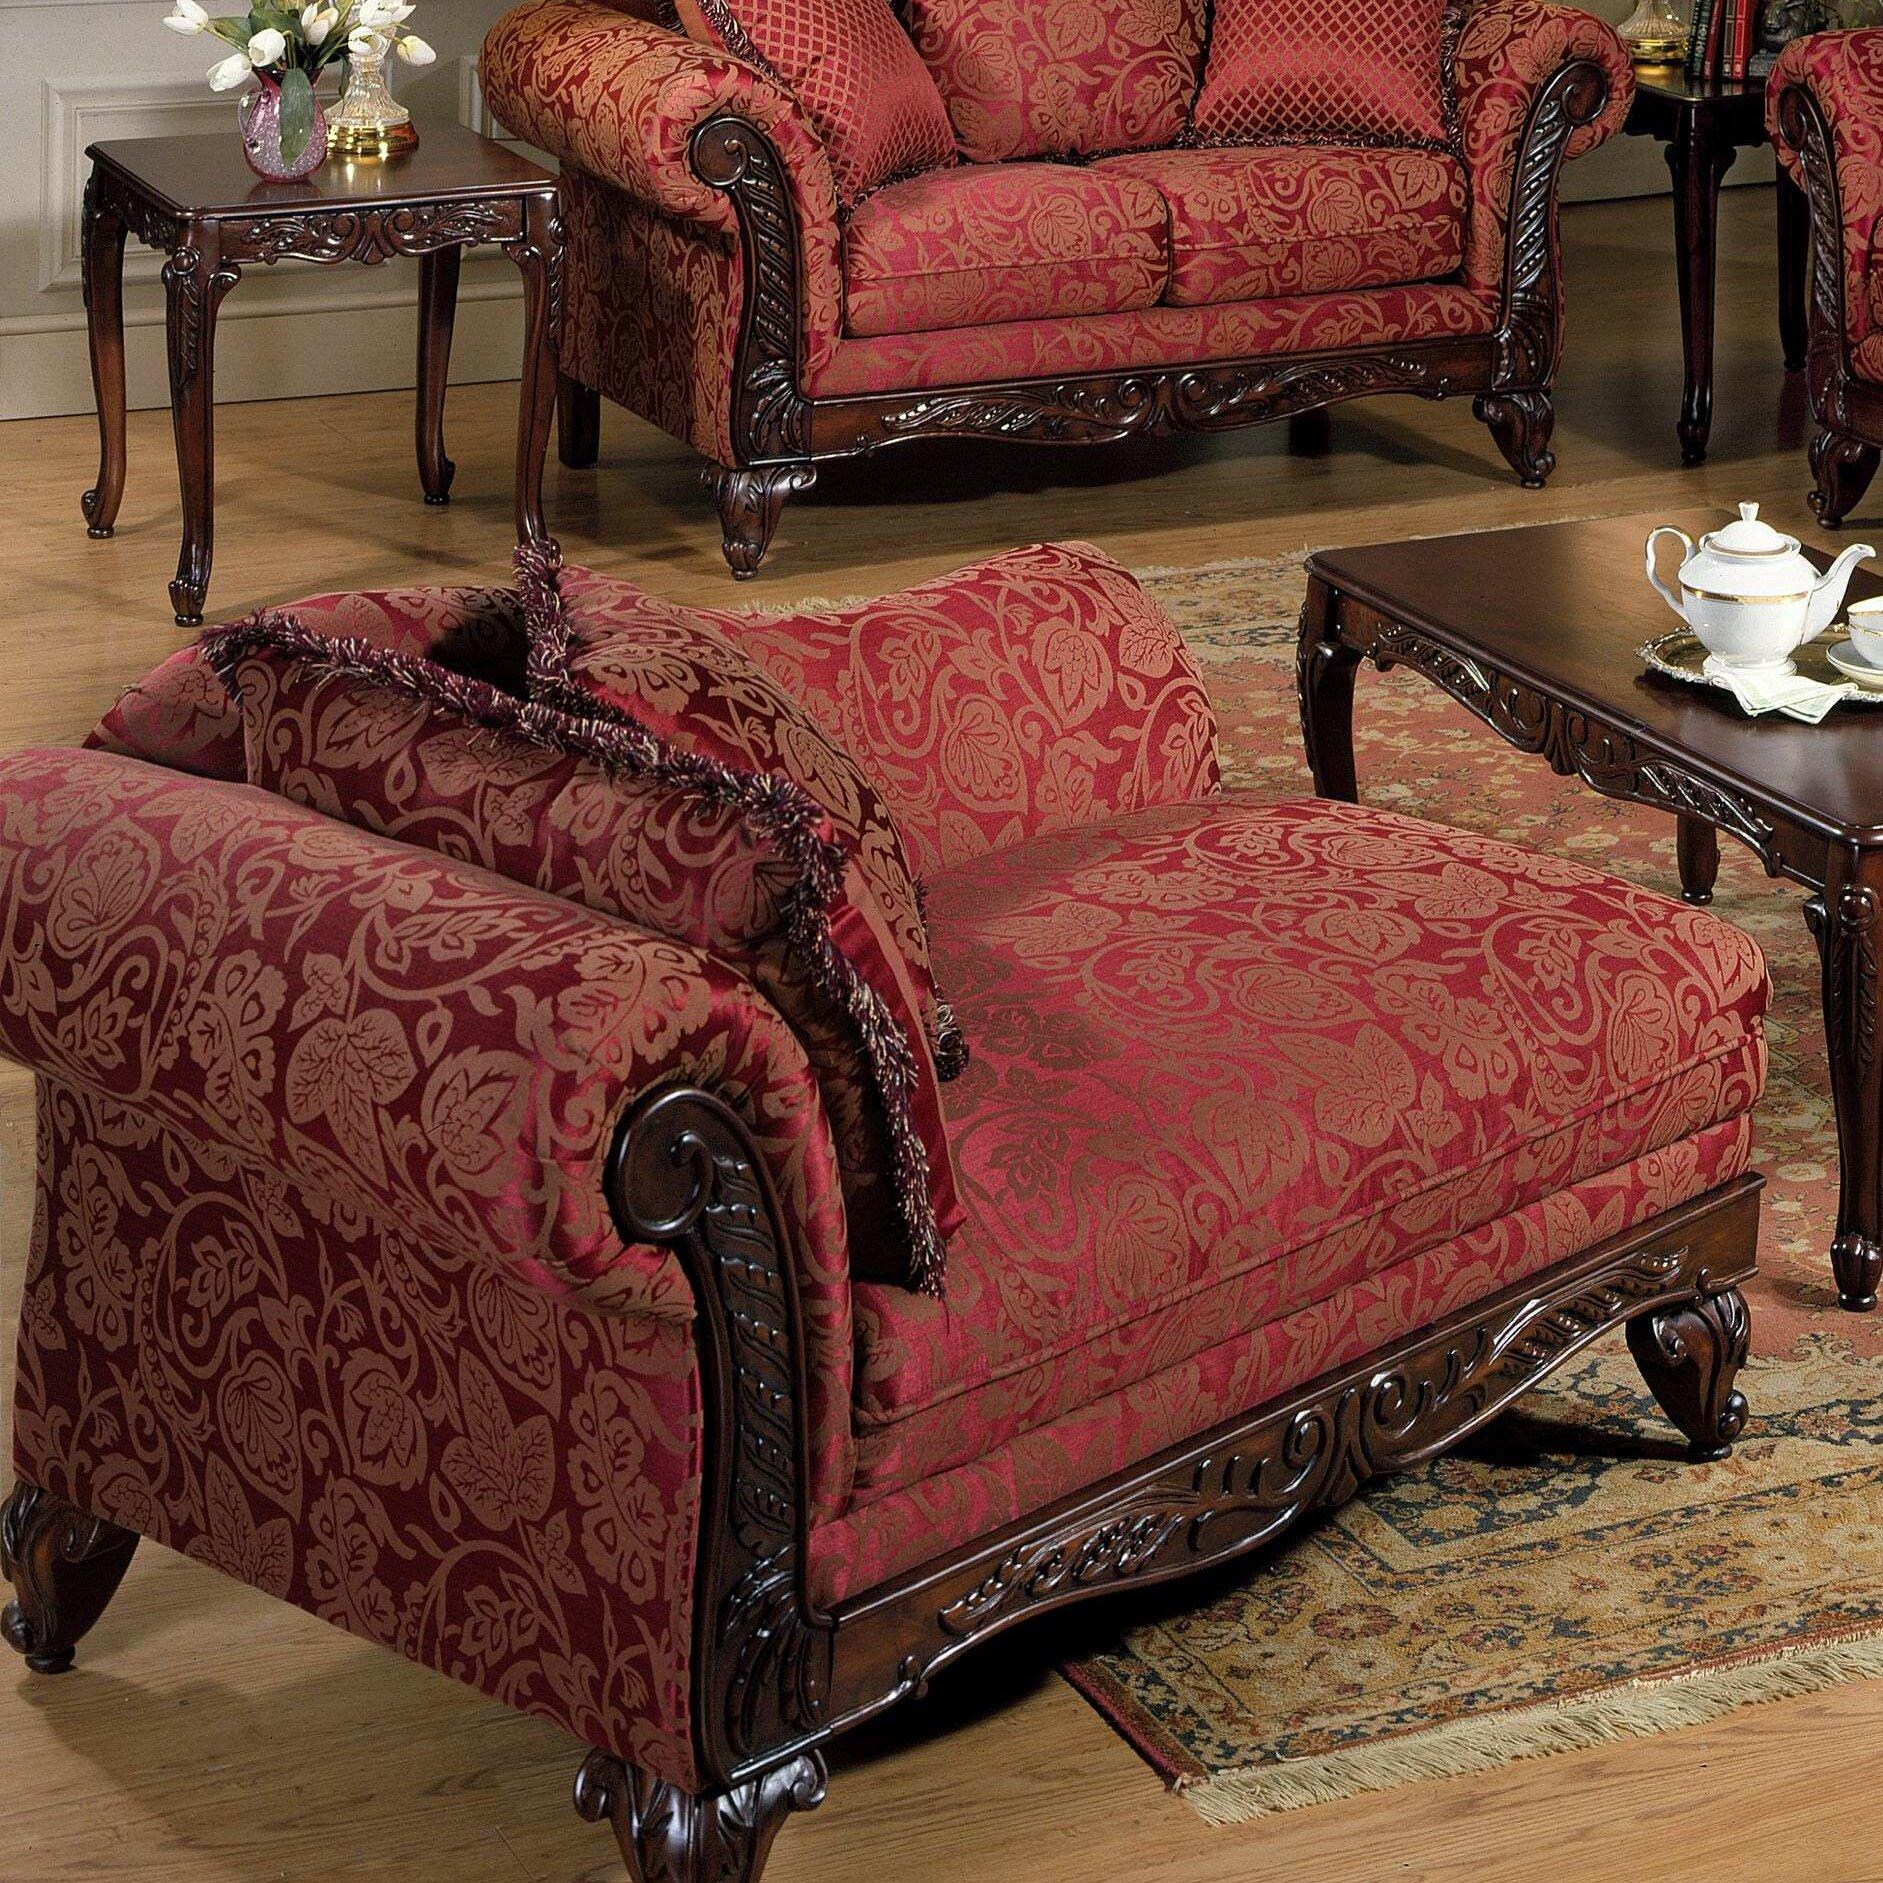 Astoria Grand Serta Upholstery Belmond Chaise Lounge